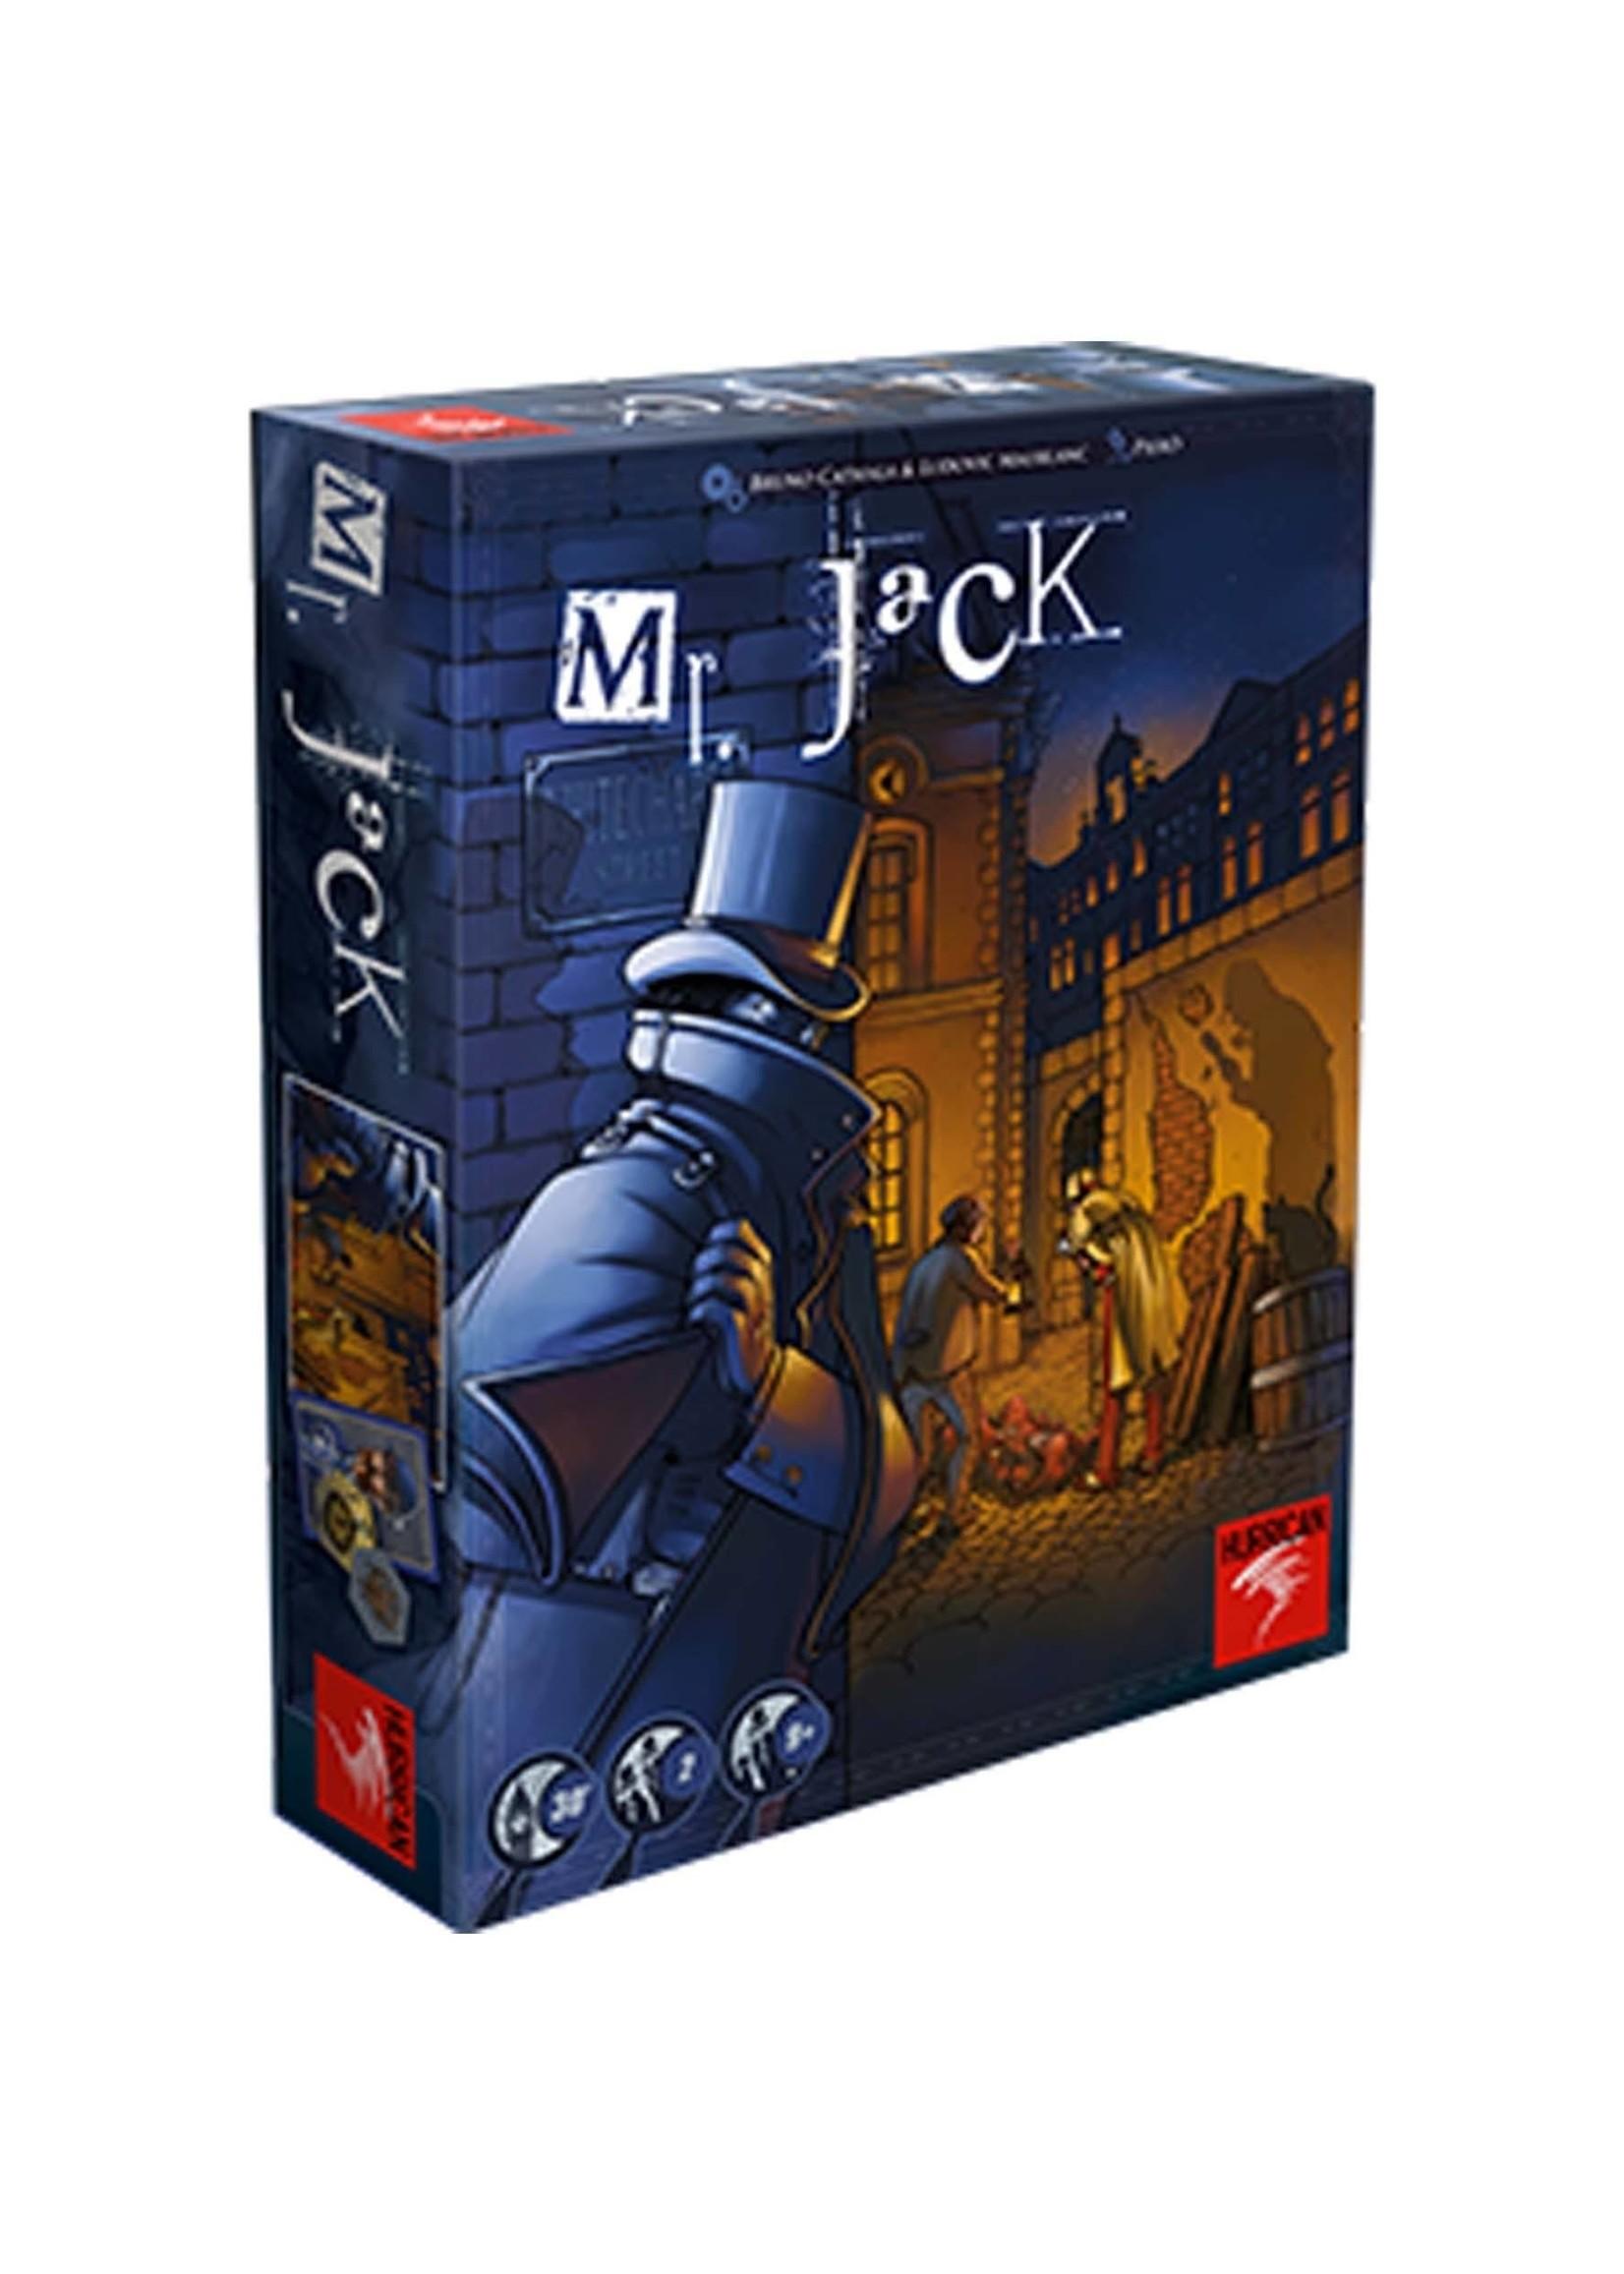 Mr. Jack (Revised Edition)